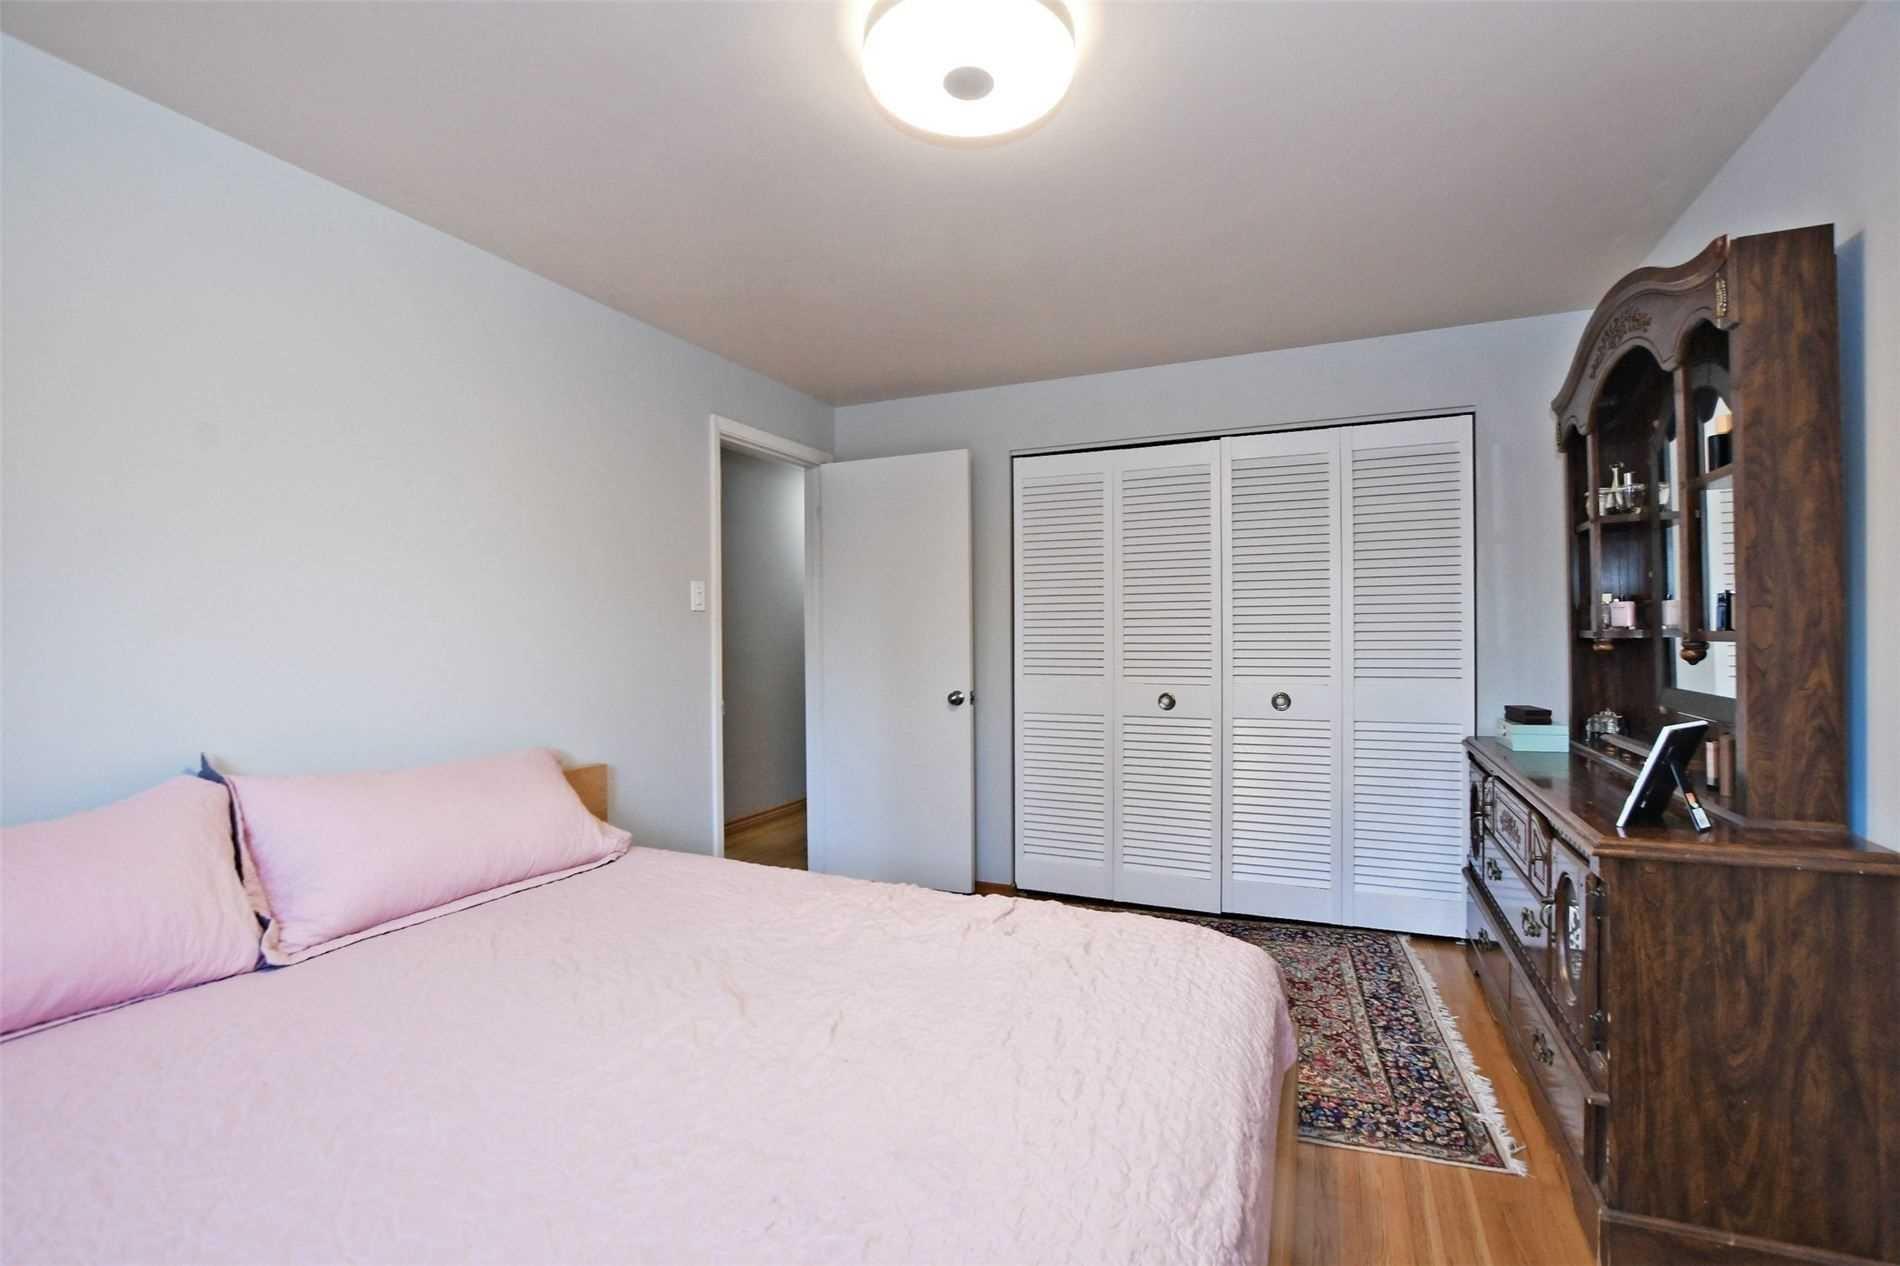 6 Avonmore Sq, Toronto, Ontario M1E1C9, 3 Bedrooms Bedrooms, 6 Rooms Rooms,3 BathroomsBathrooms,Detached,For Sale,Avonmore,E5277763